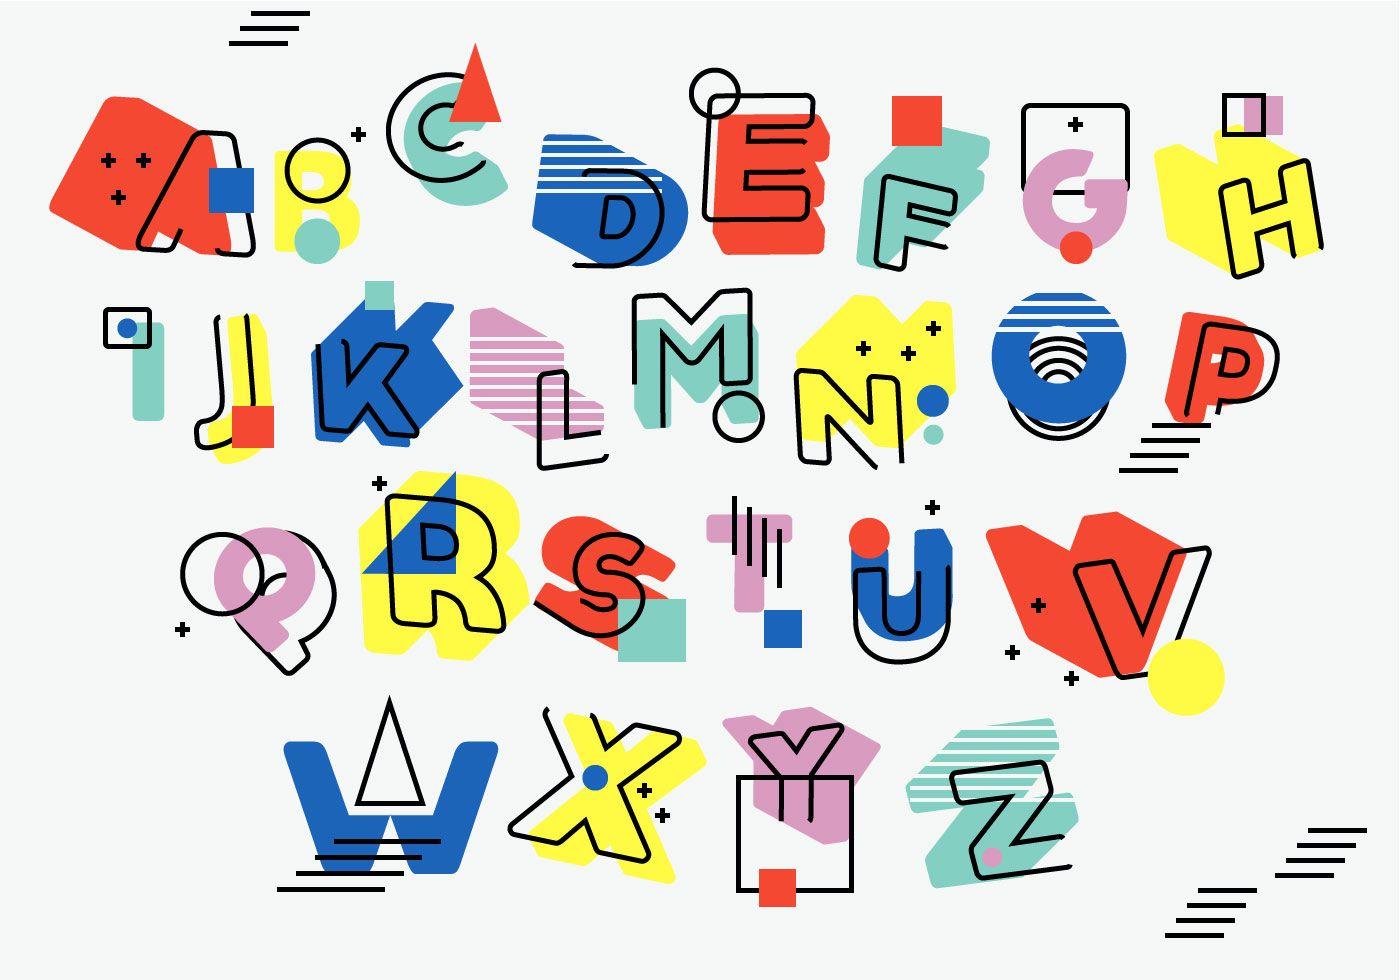 Vintage Retro 3D Asimetric Memphis Style Alphabet Vector Set #memphisdesign